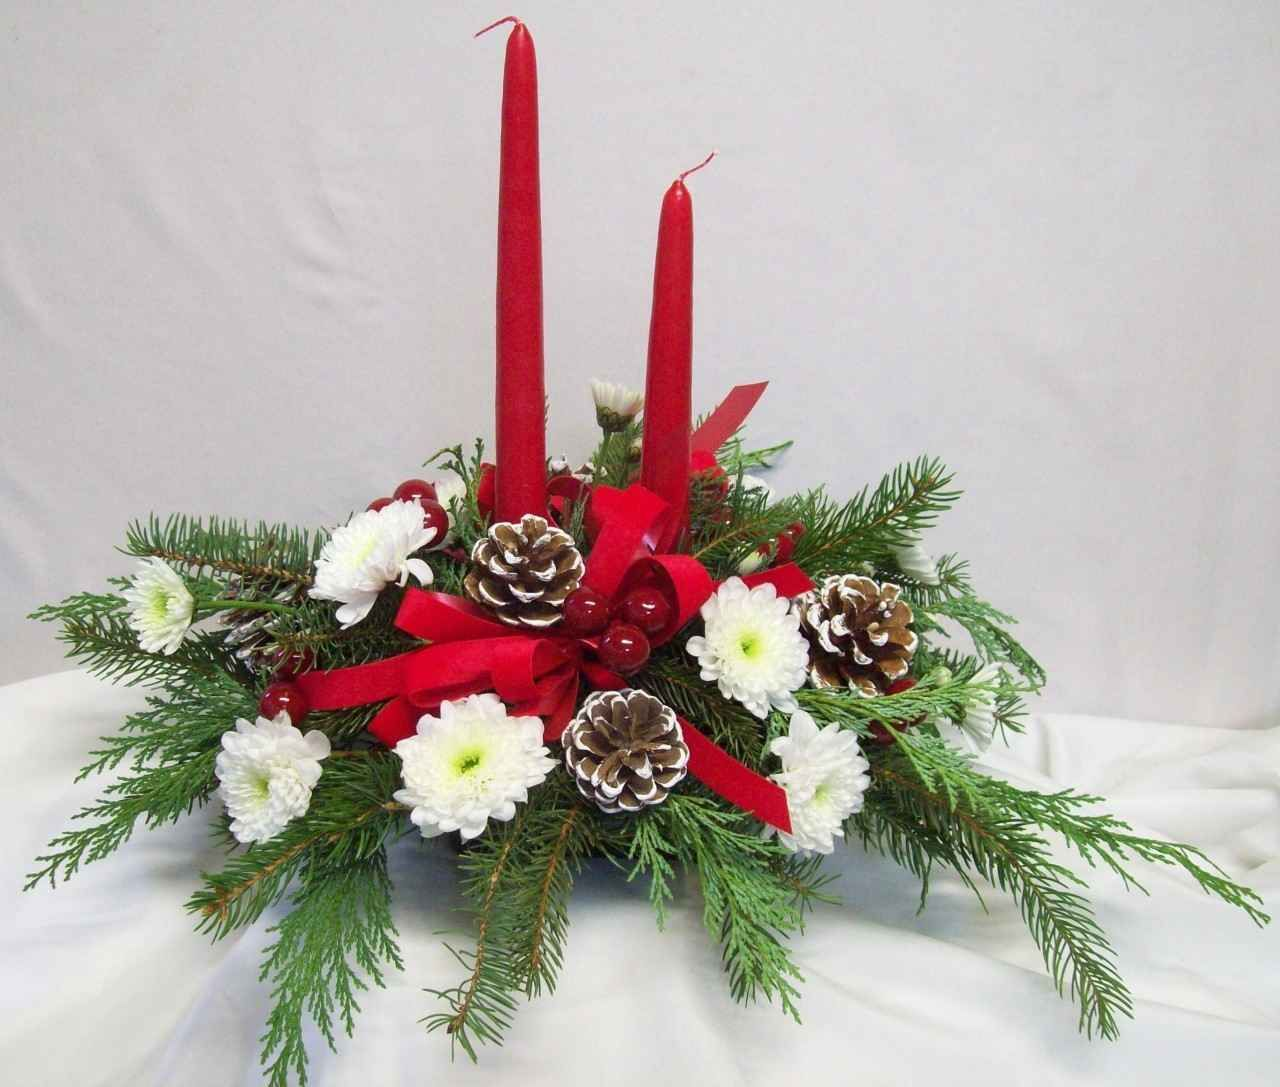 Xmas Centerpieces Elegant Christmas Centerpieces .elegant Christmas